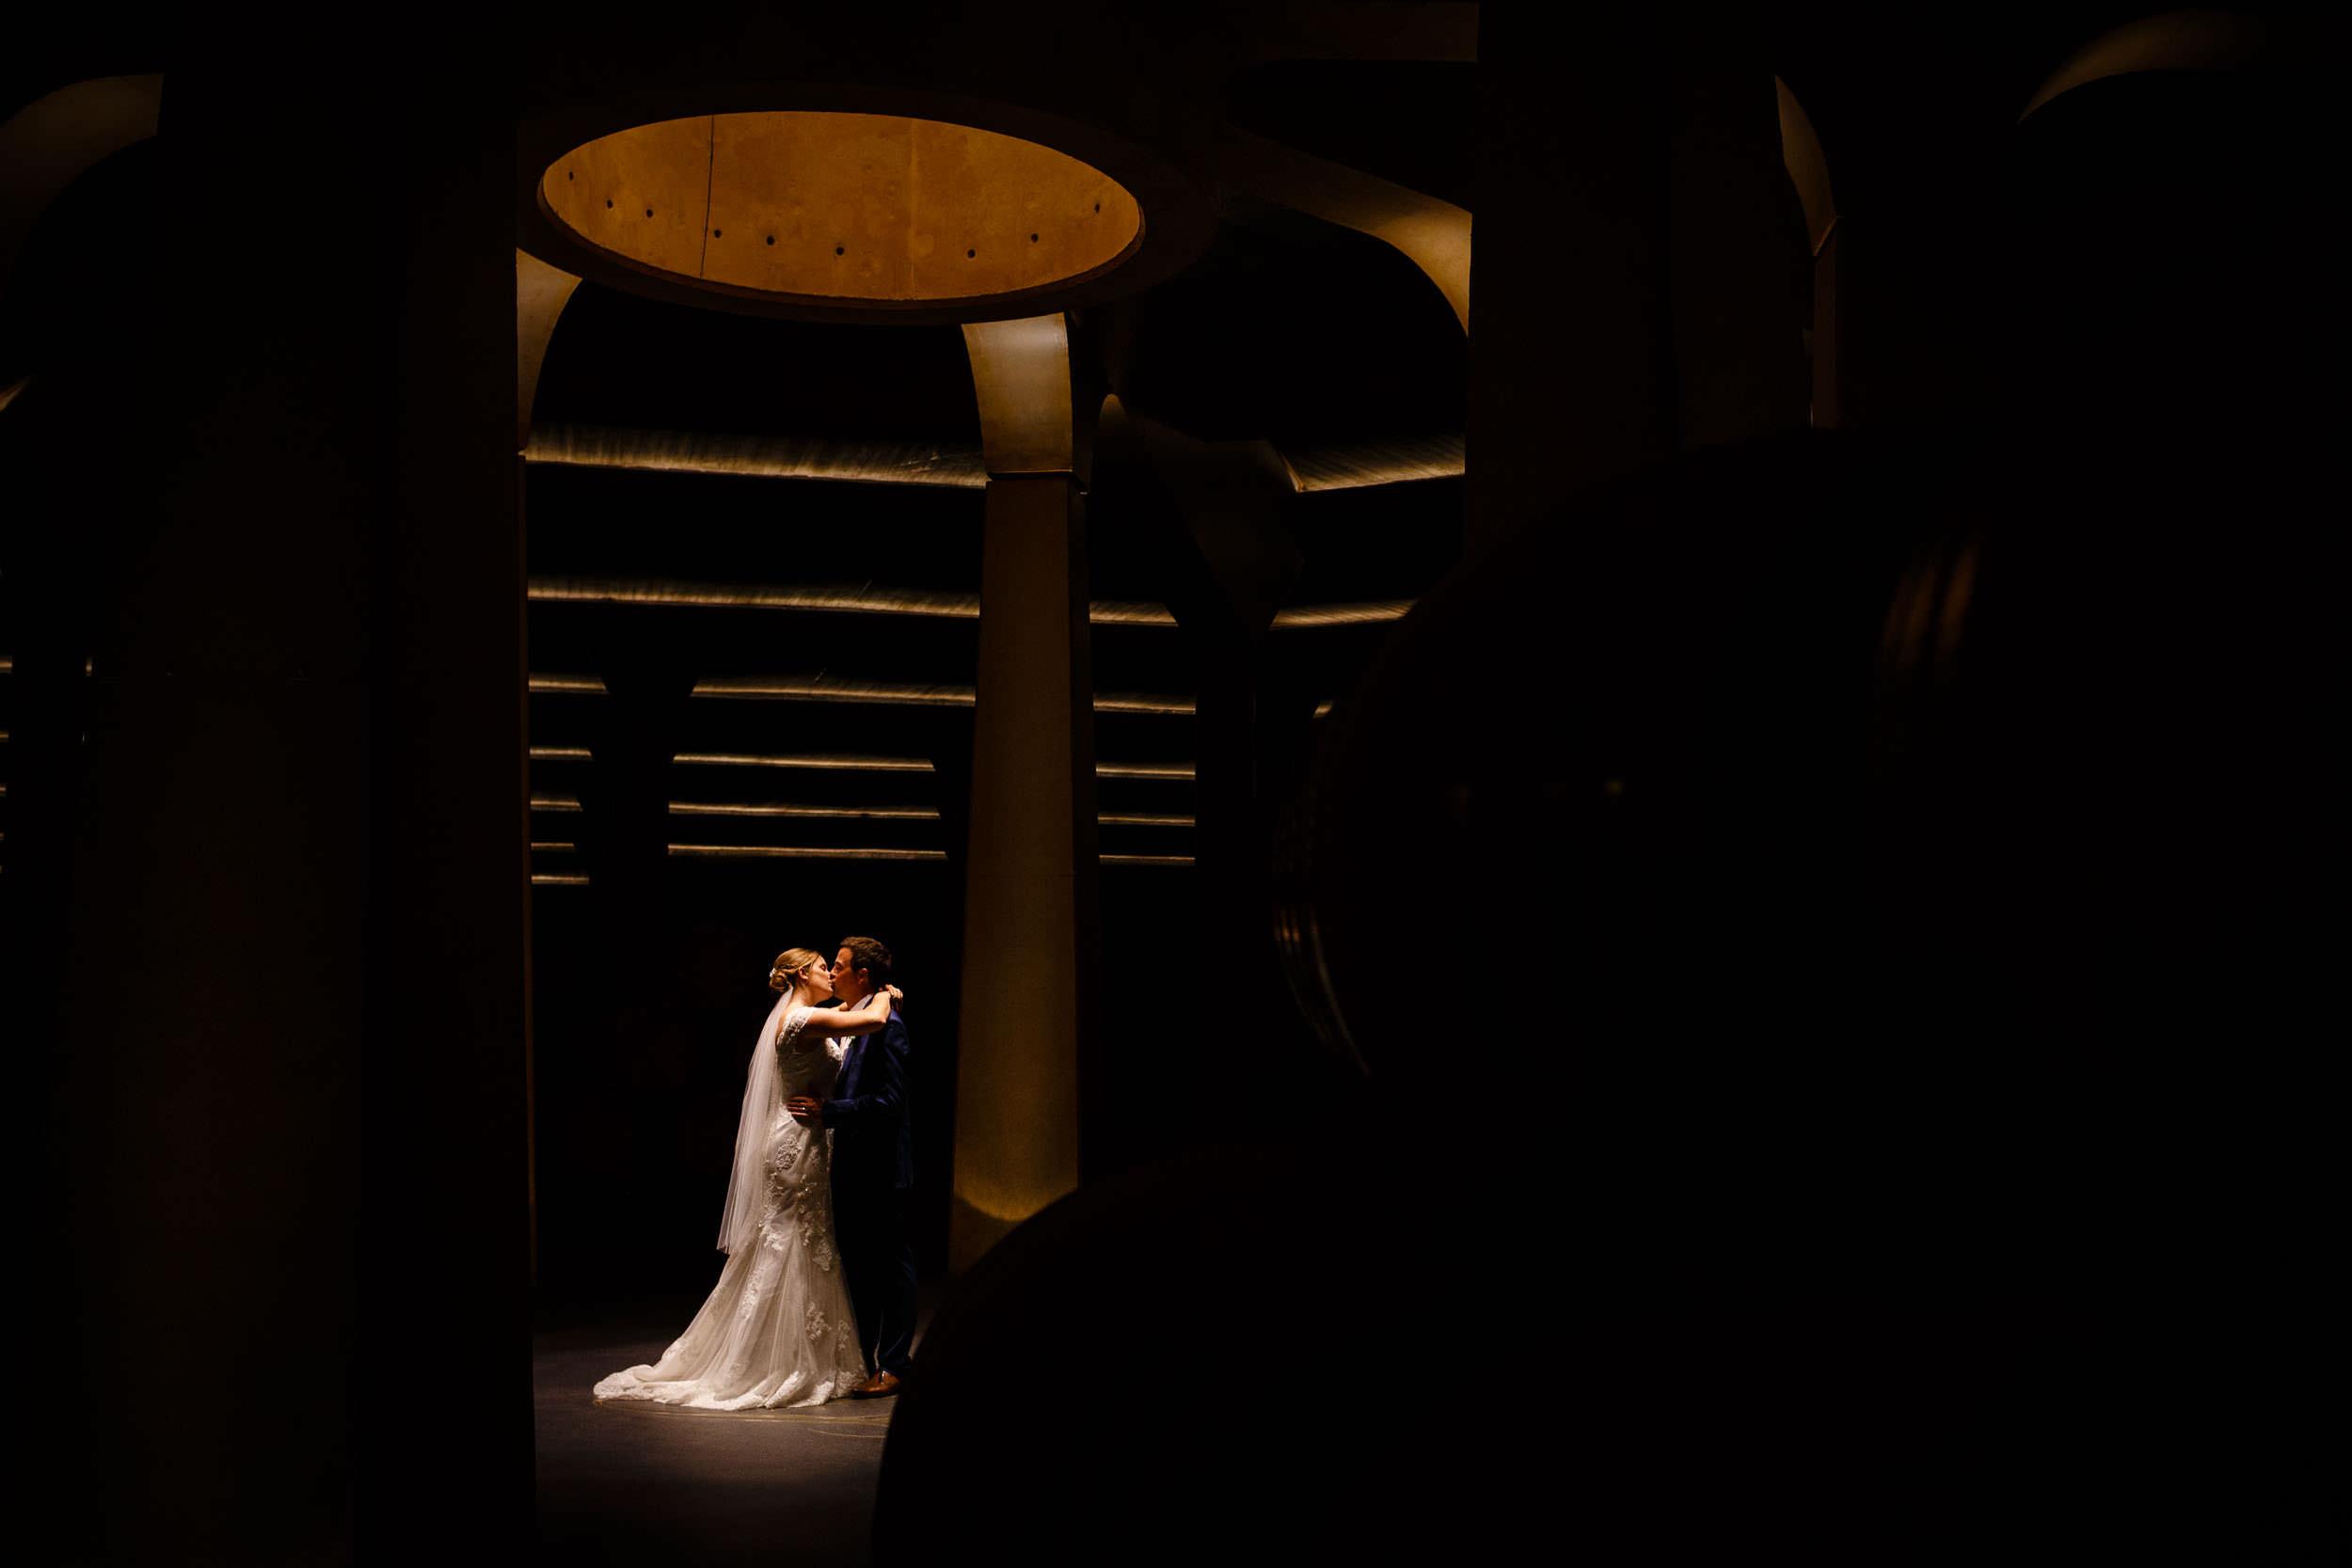 Wedding Photographer La Rioja Basque Country Spain - James Sturcke - sturcke.org_041.jpg